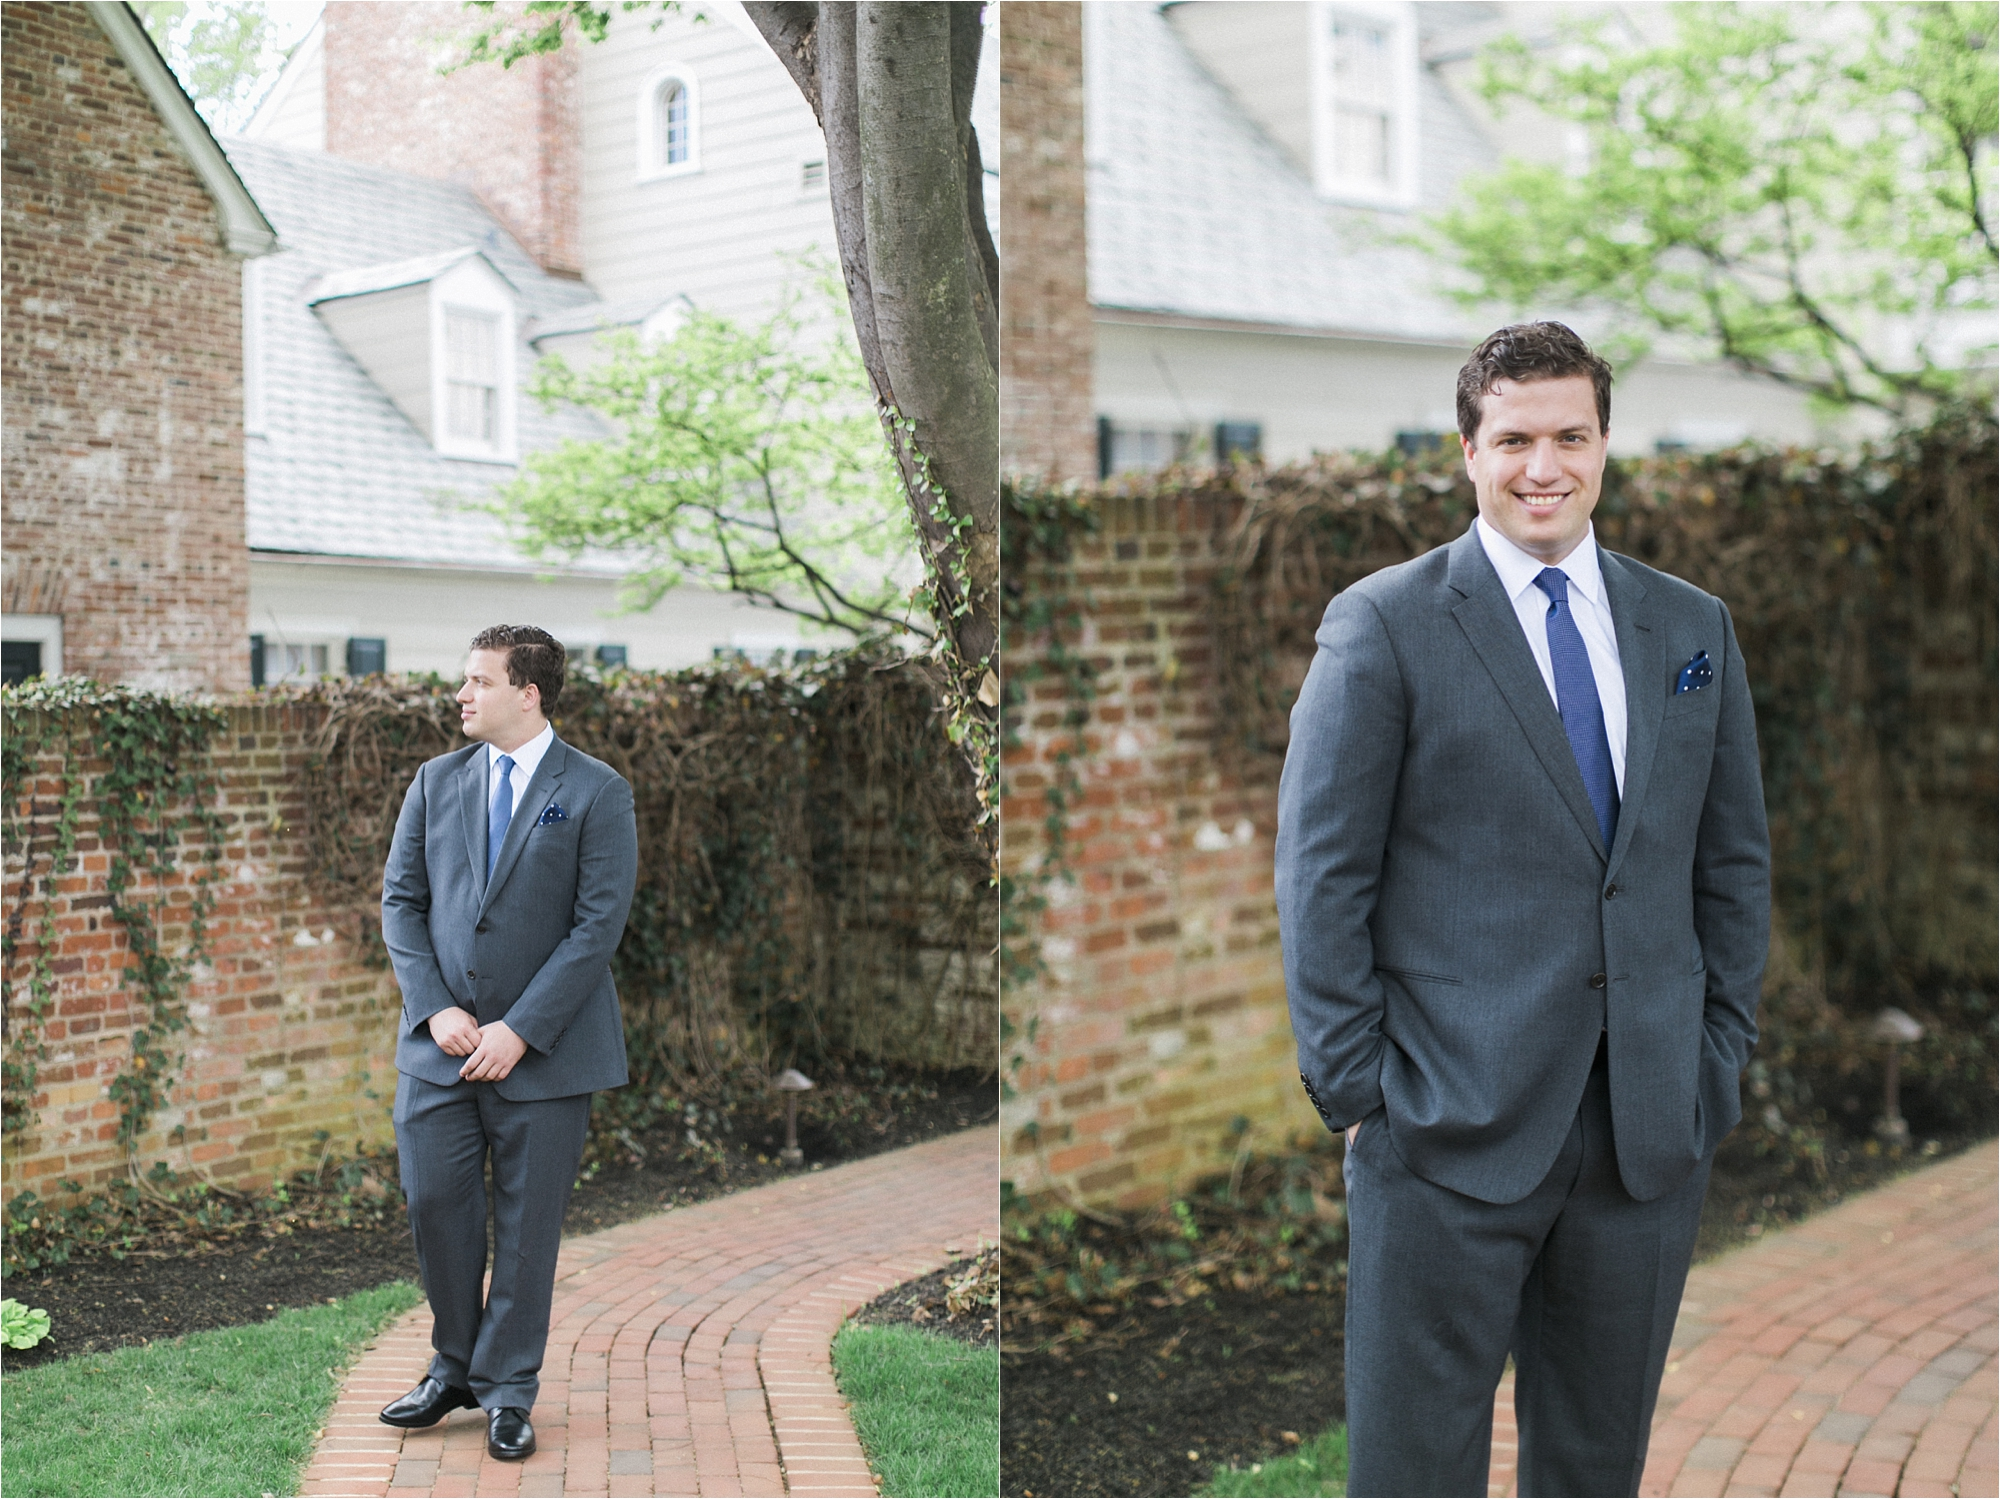 tom-jill-baltimore-maryland-industrial-elegant-wedding-008.JPG